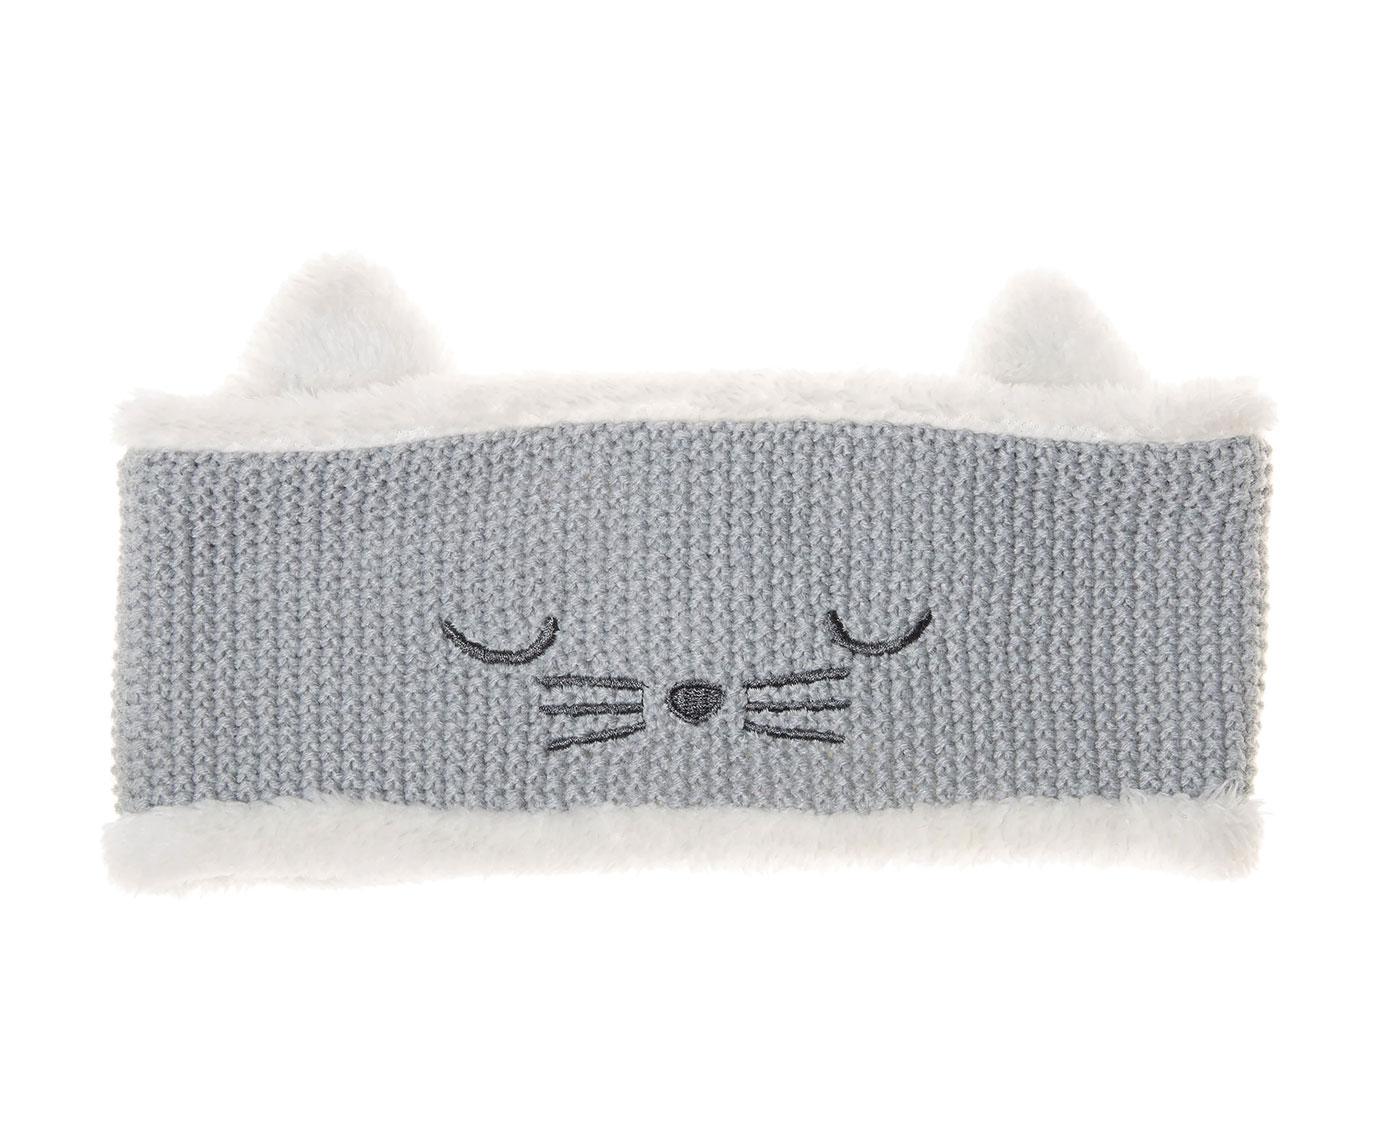 Hoofdband 'Knitty Knit'